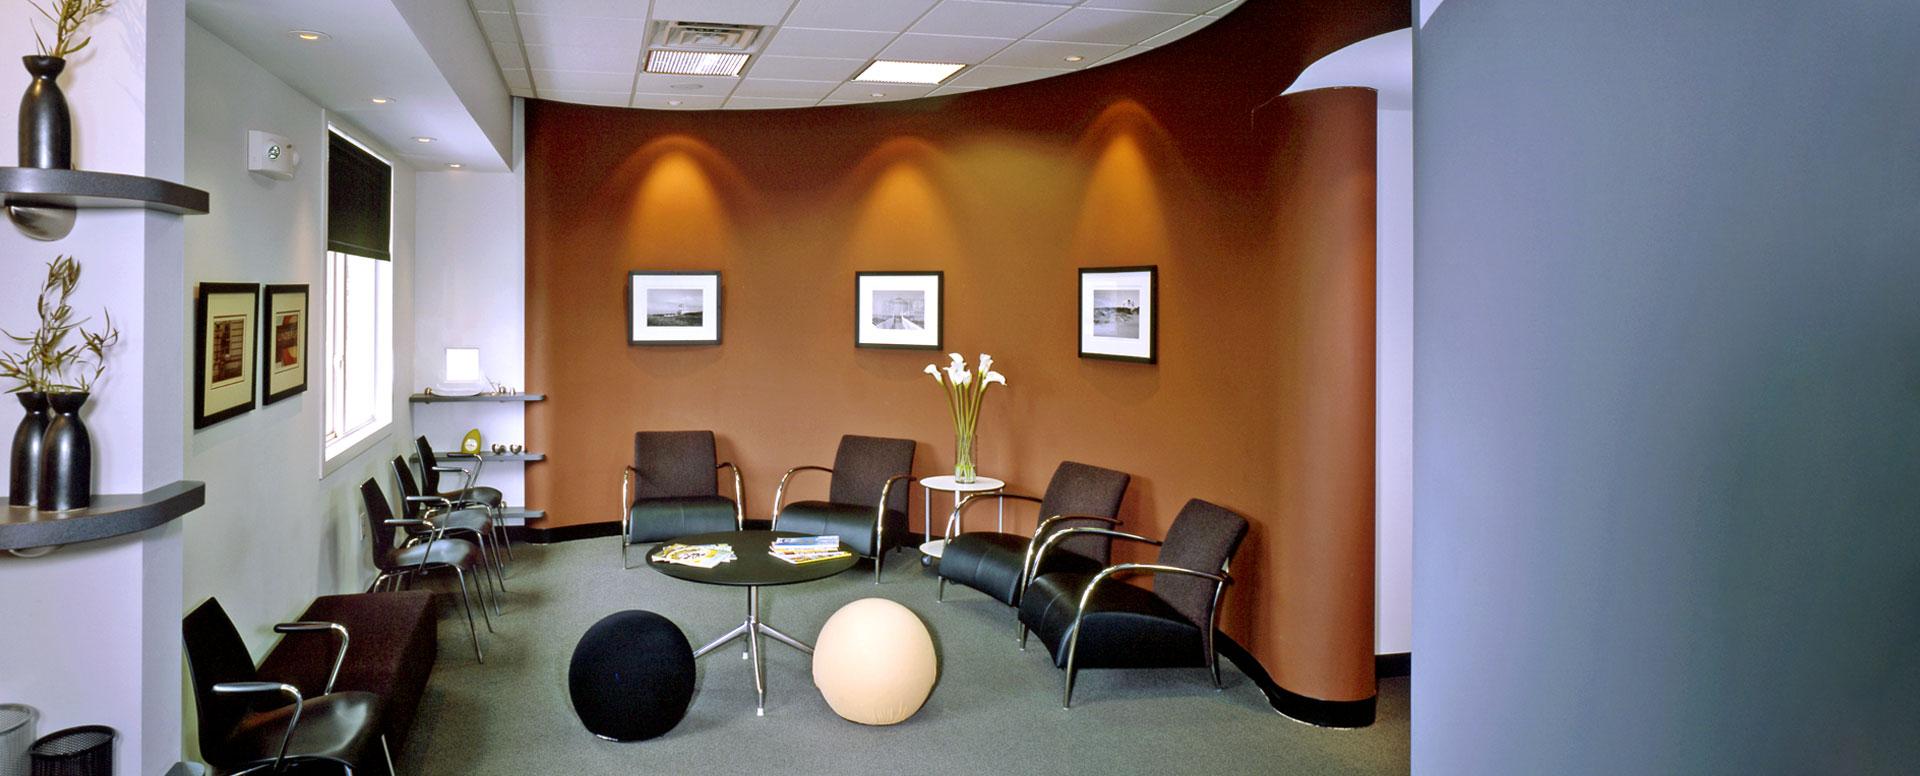 Office environment design